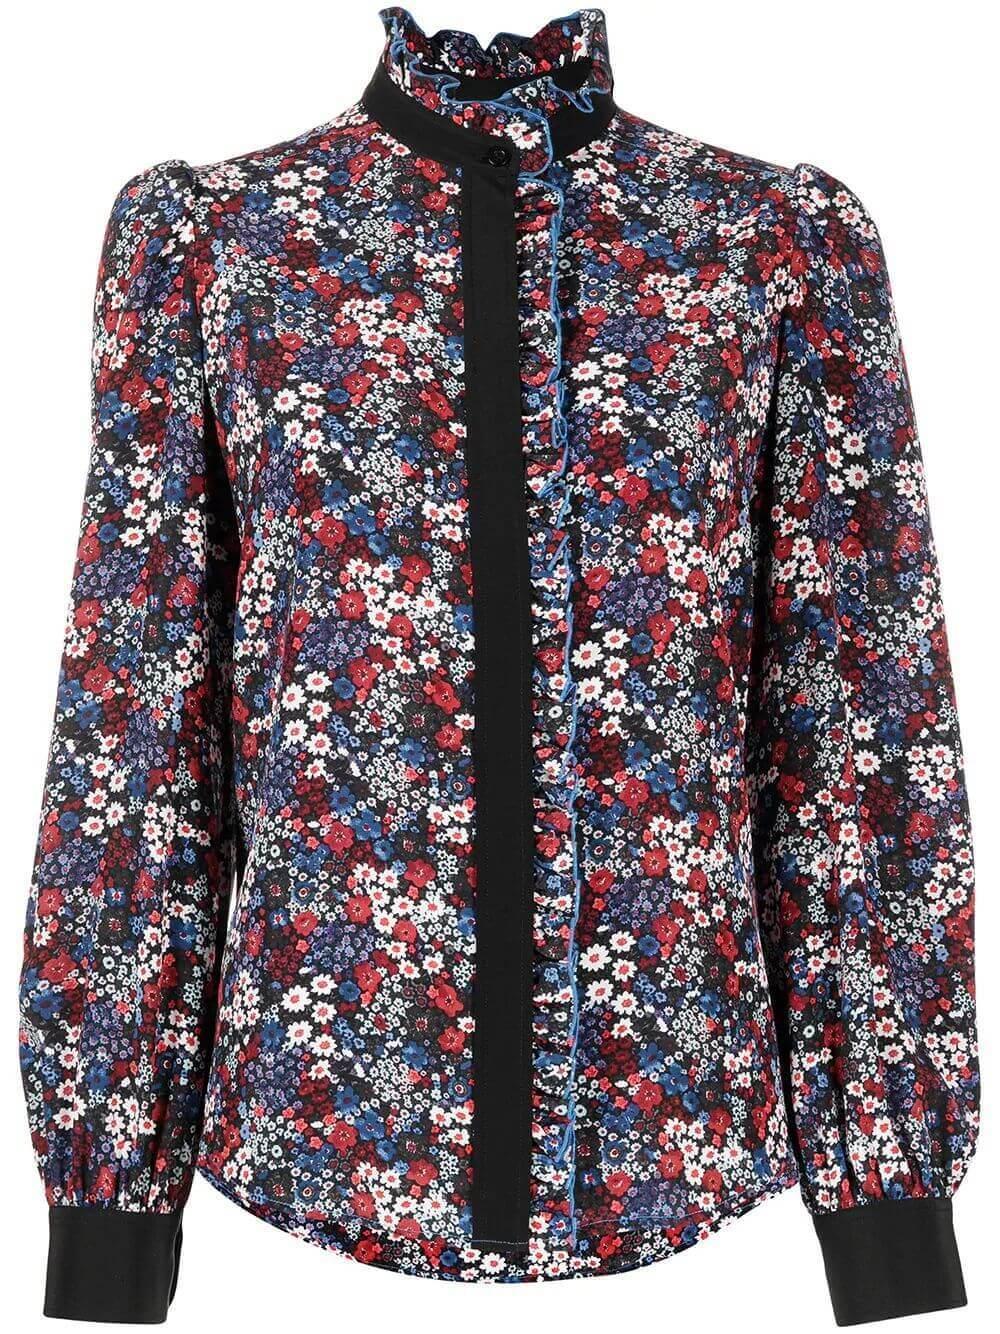 Floral Print Ruffle Neck Blouse Item # CHS21SHT08027